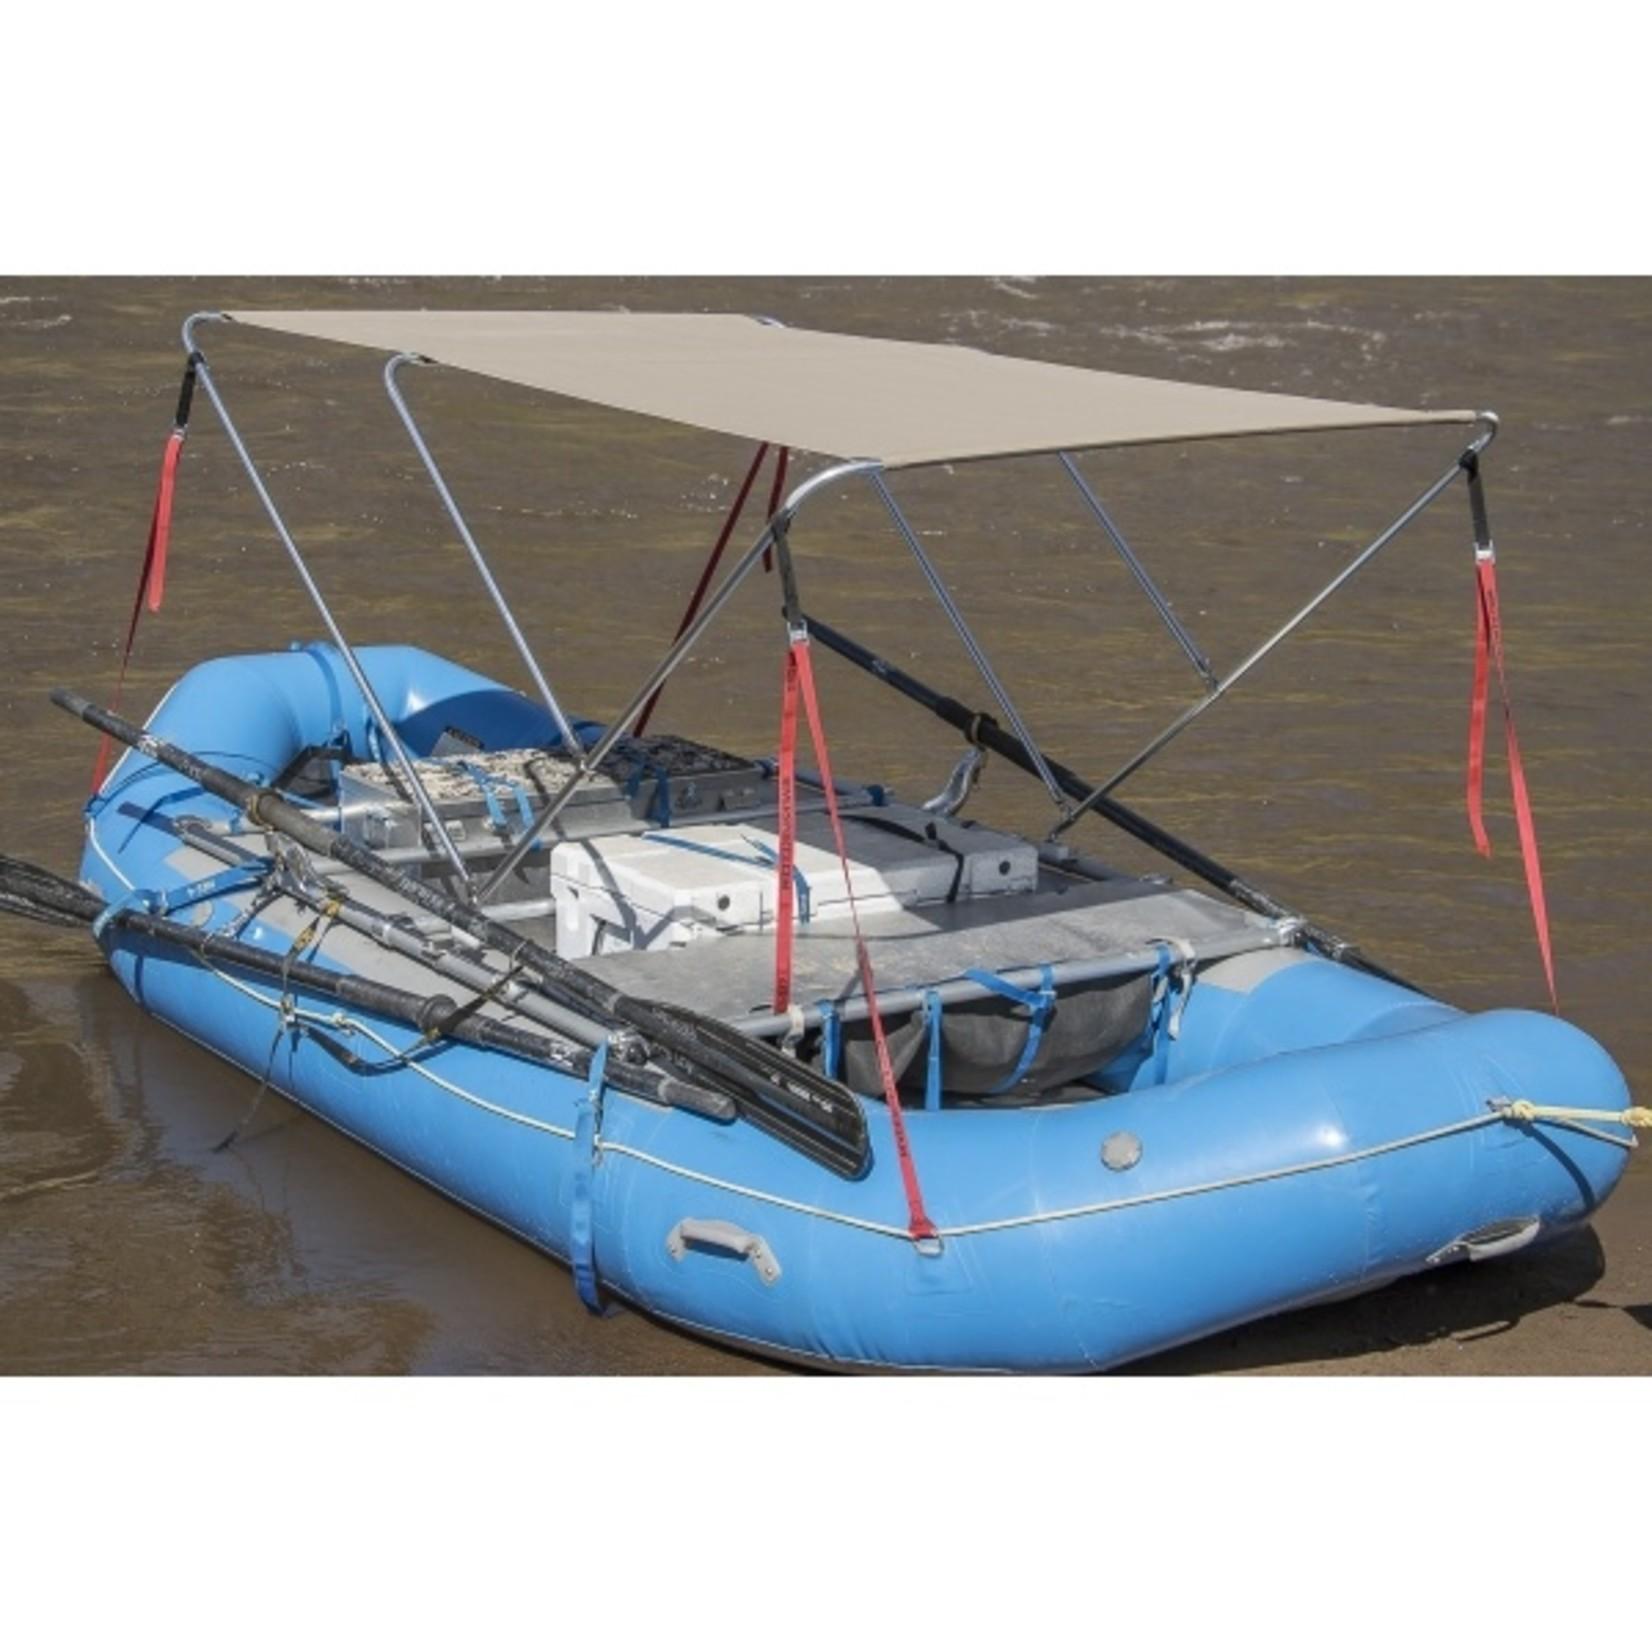 Coyote River Gear Coyote Raft Bimini